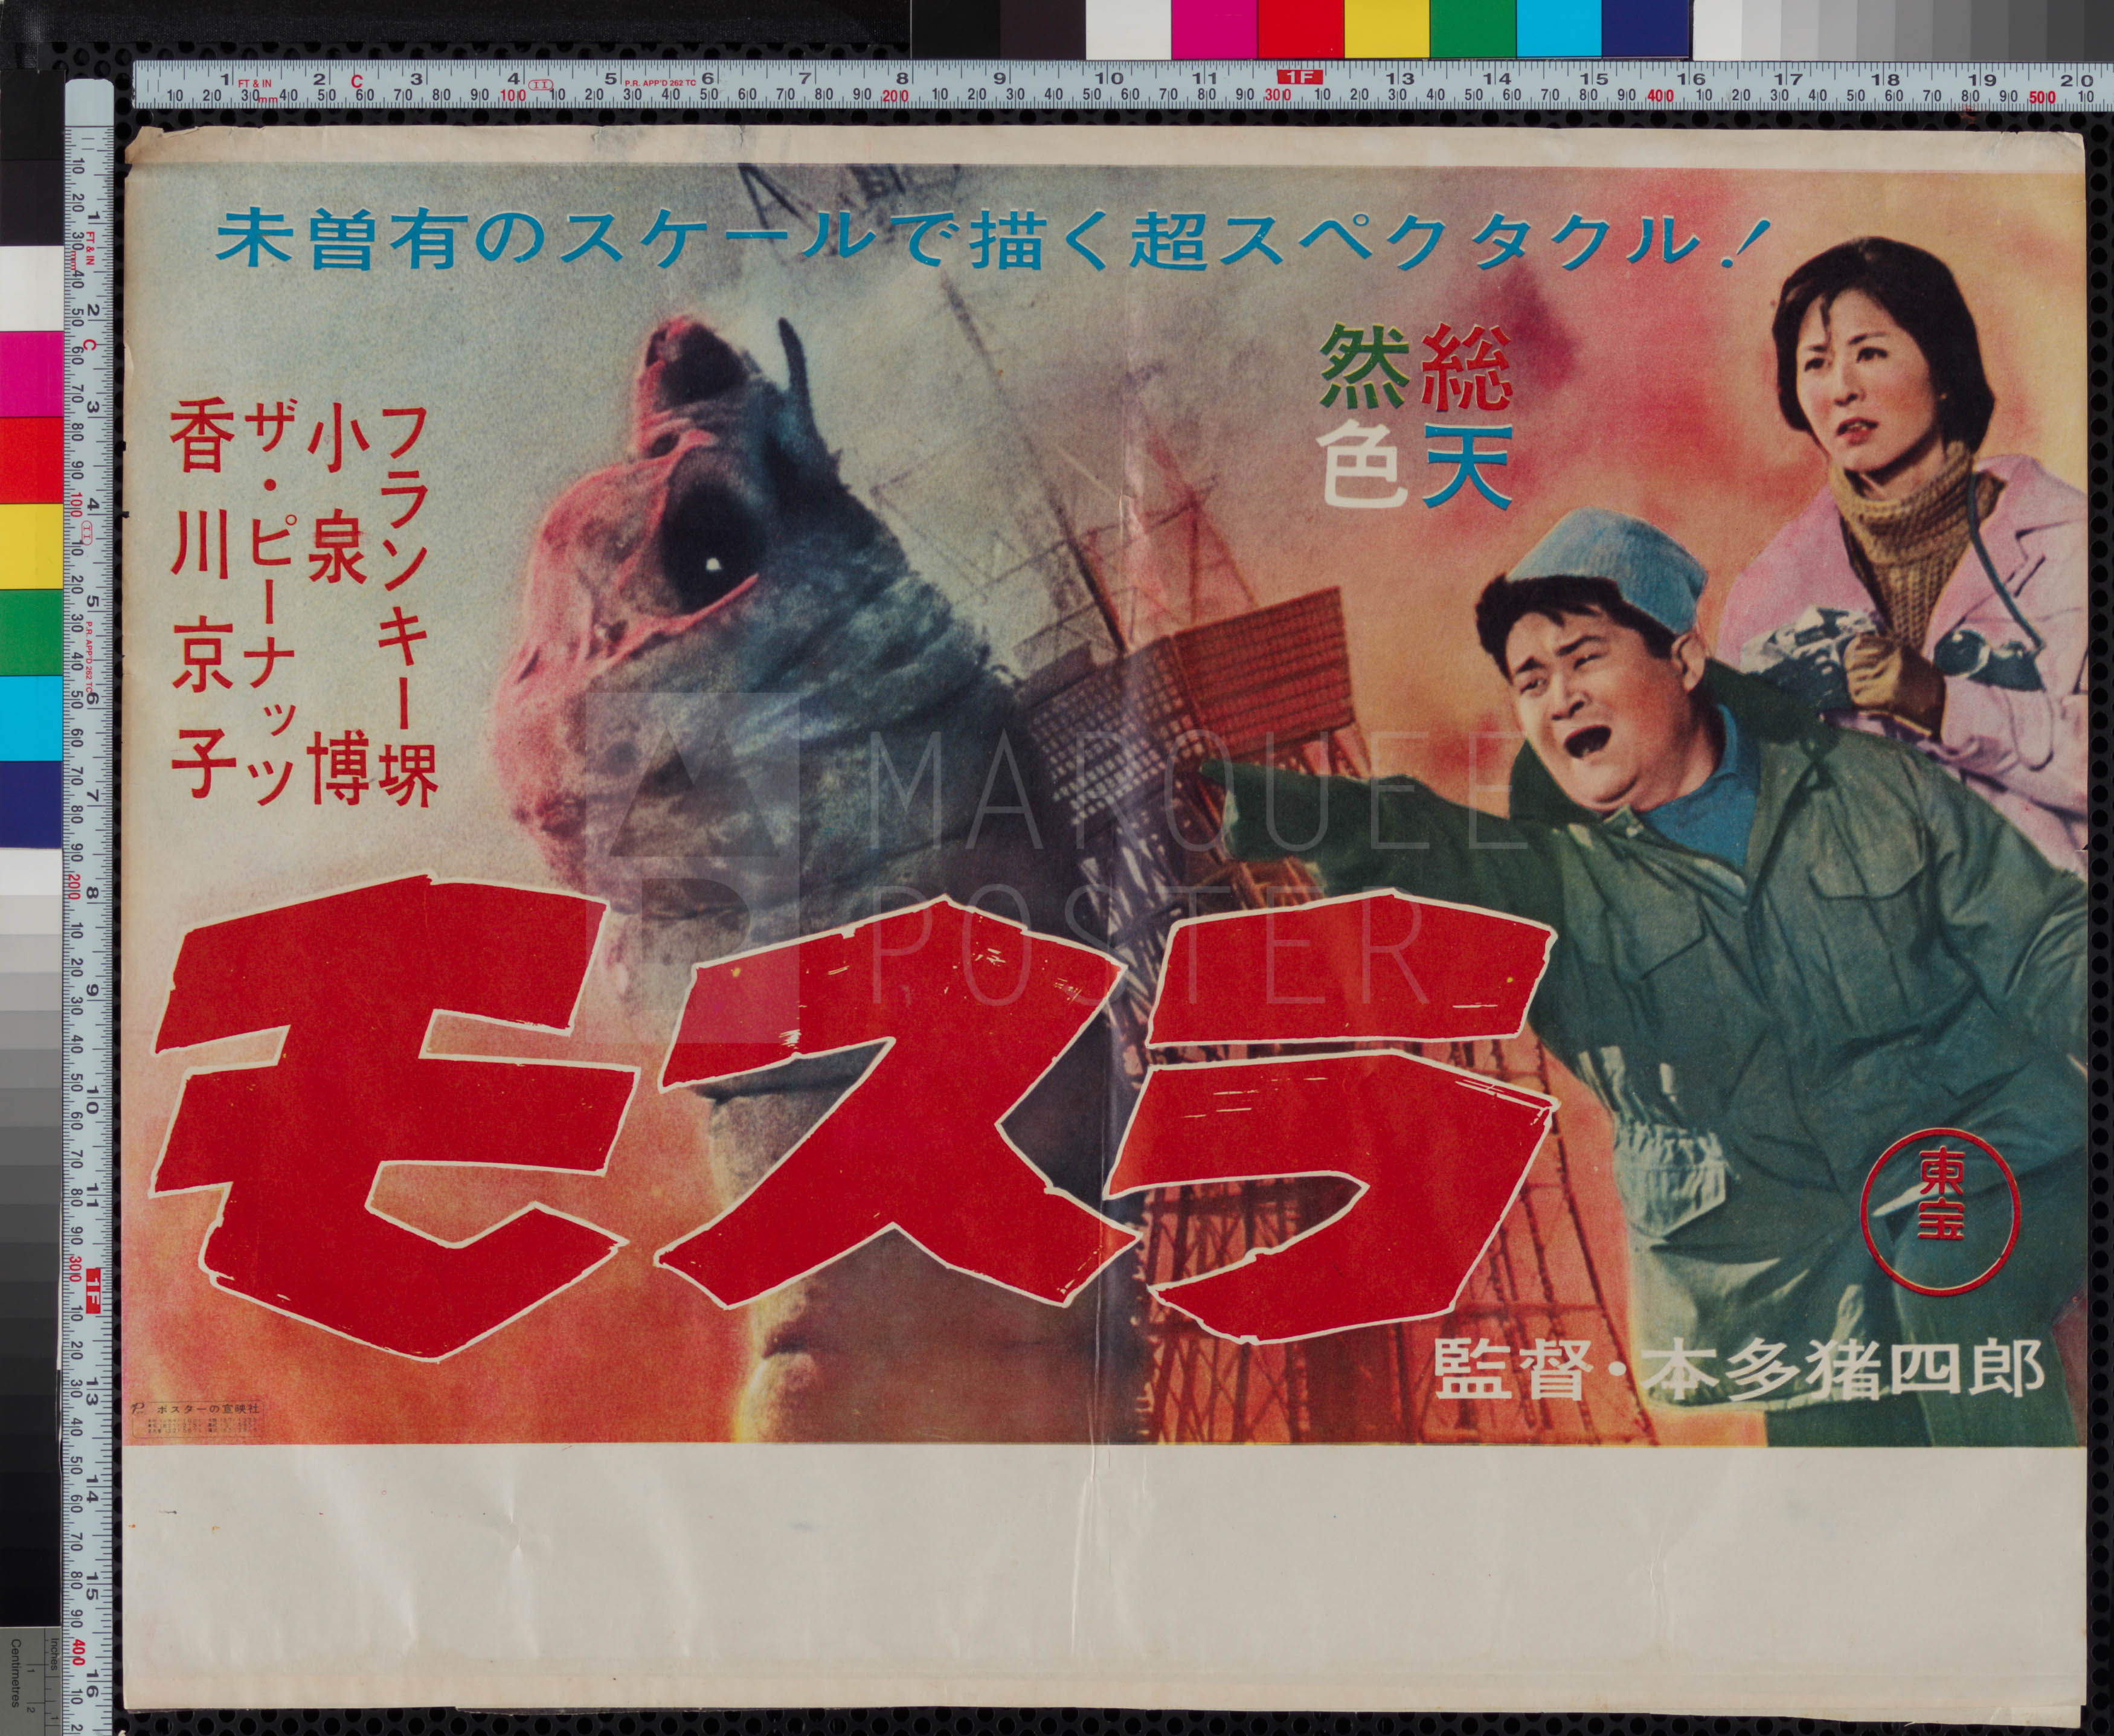 32-mothra-transit-style-japanese-b3-1961-02